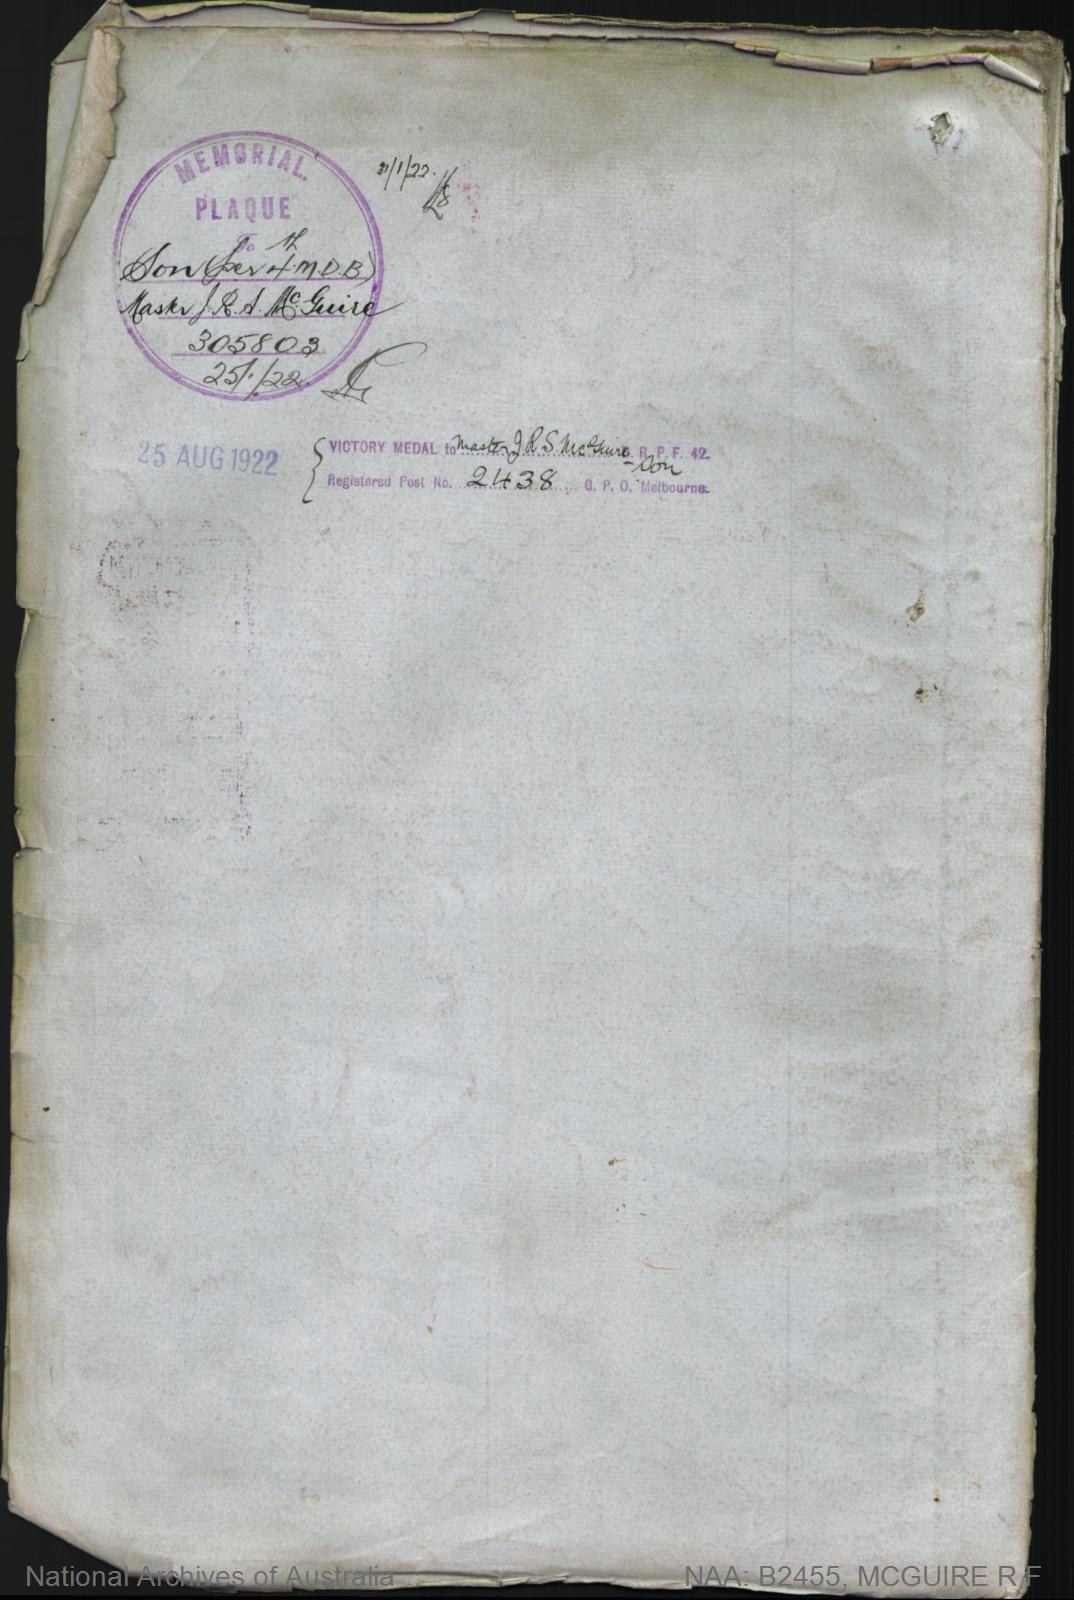 McGuire Reginald Francis : SERN 585 : POB Port Pirie SA : POE Morphettville SA : NOK F McGuire James